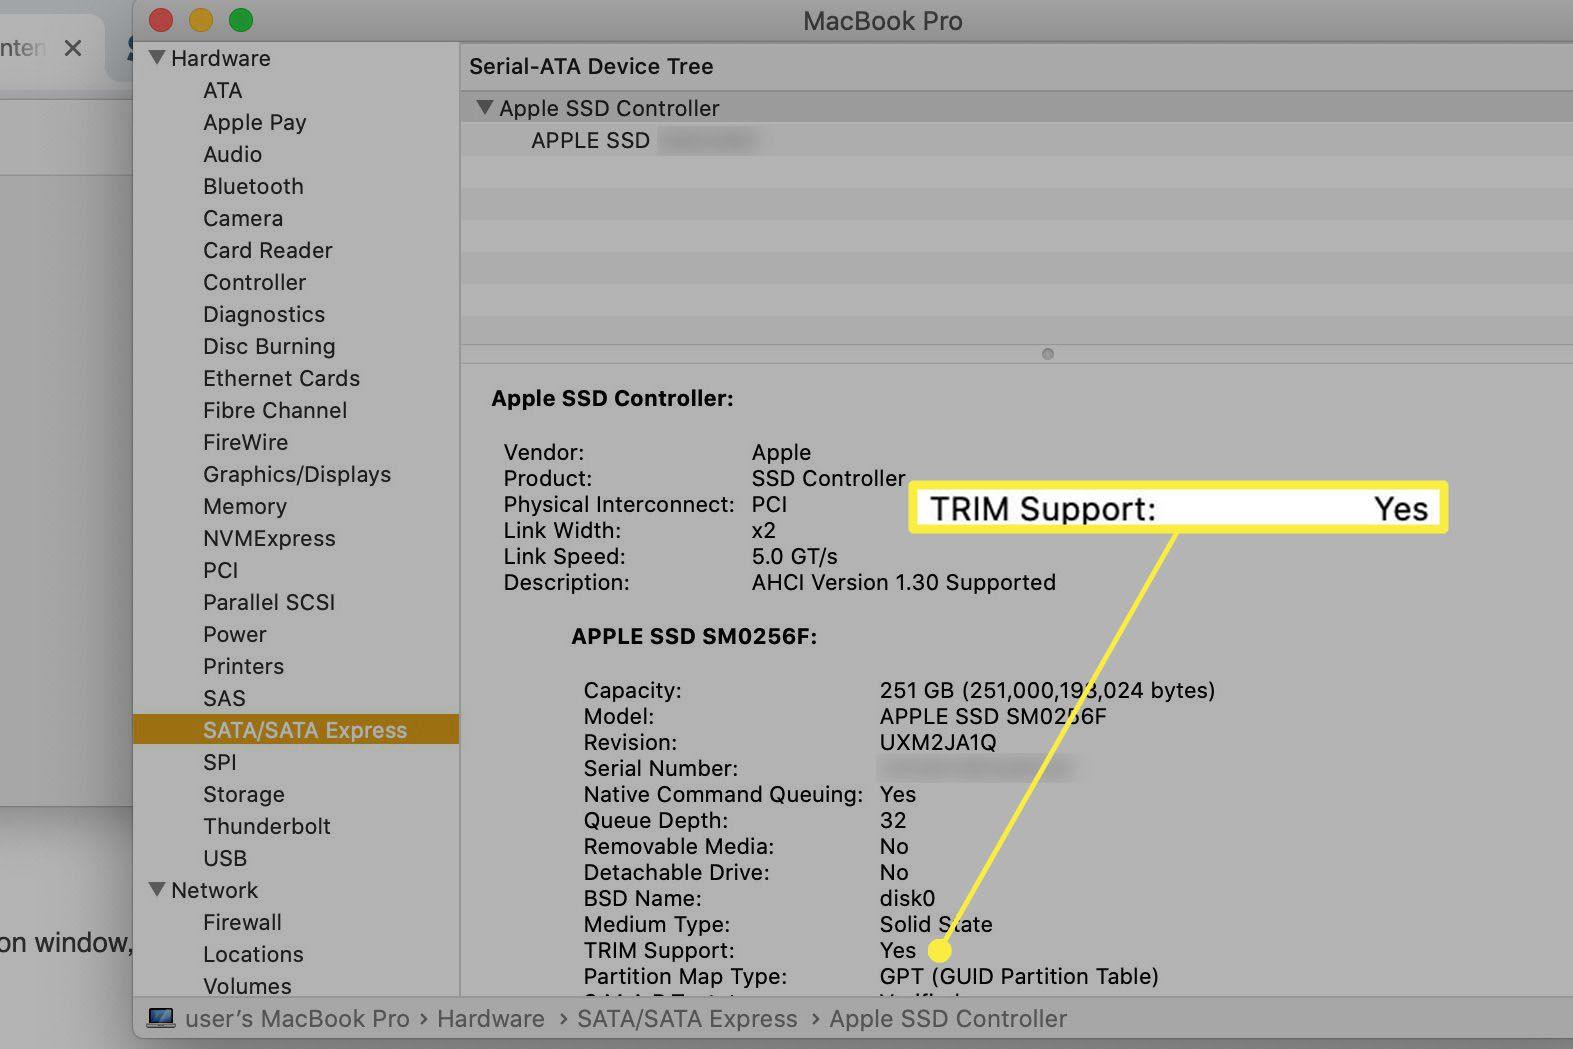 TRIM Support setting.